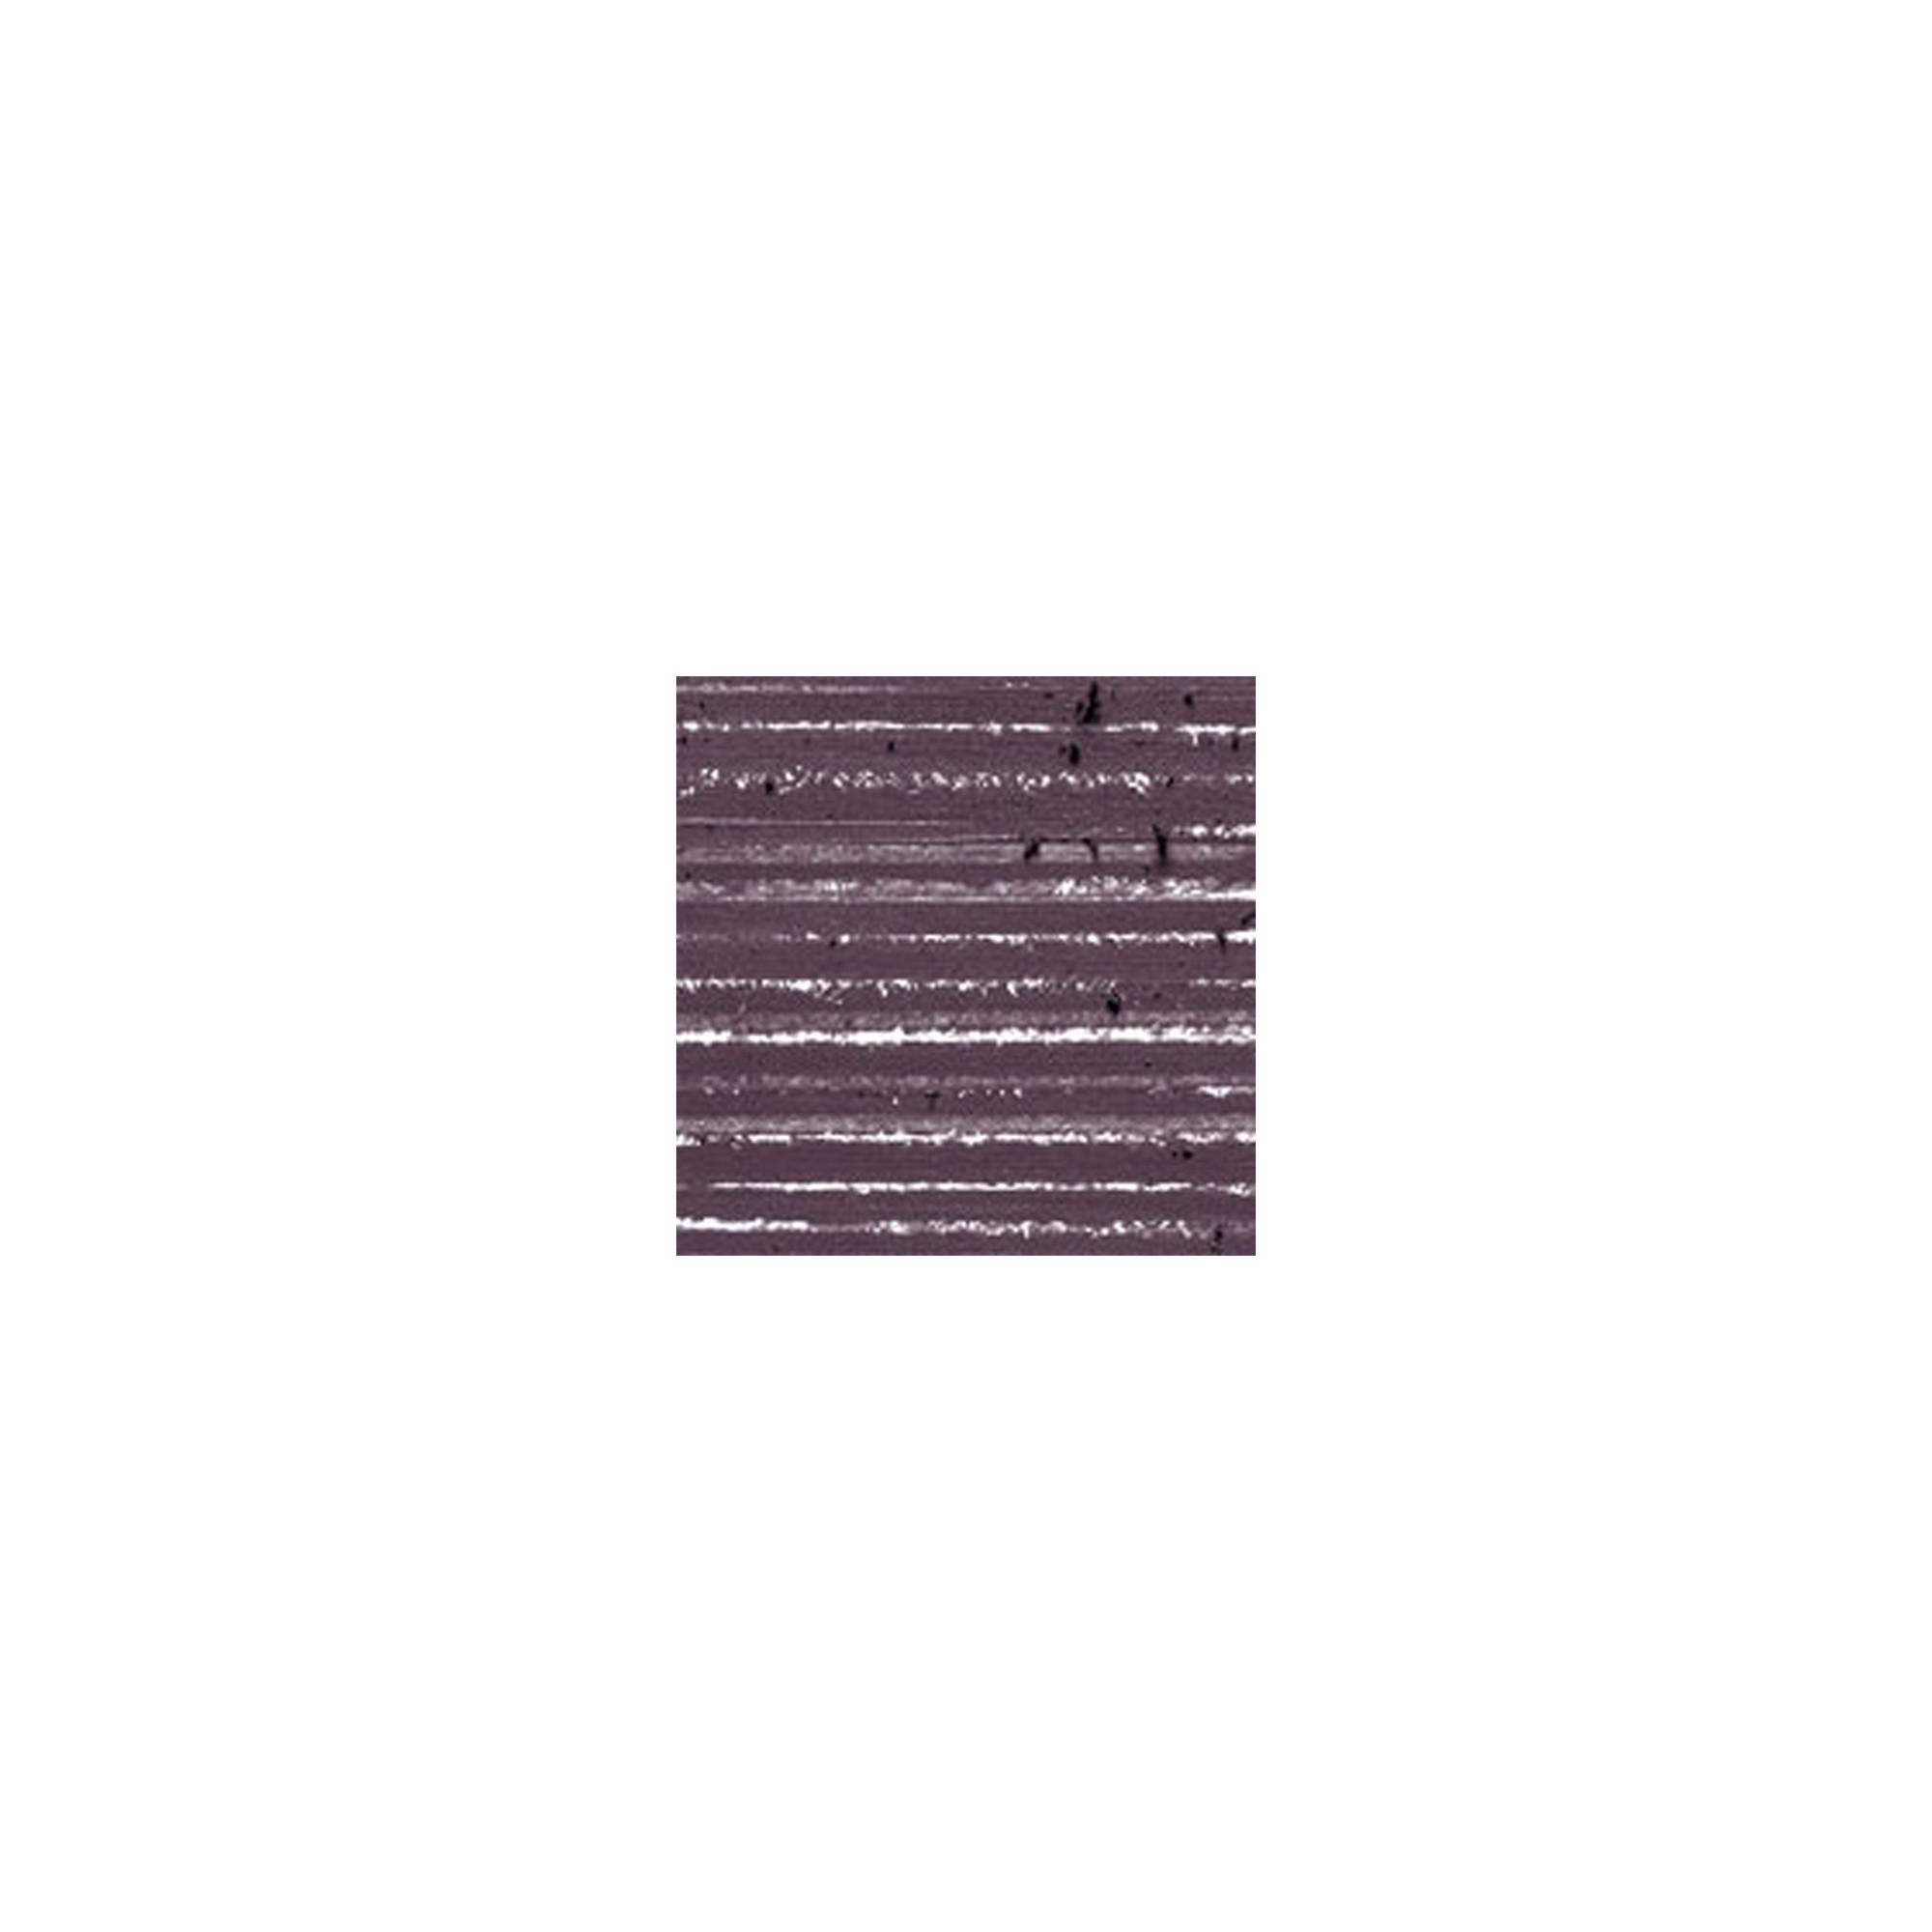 Technakohl Liner - Purple Dash, PURPLE DASH, large image number 1